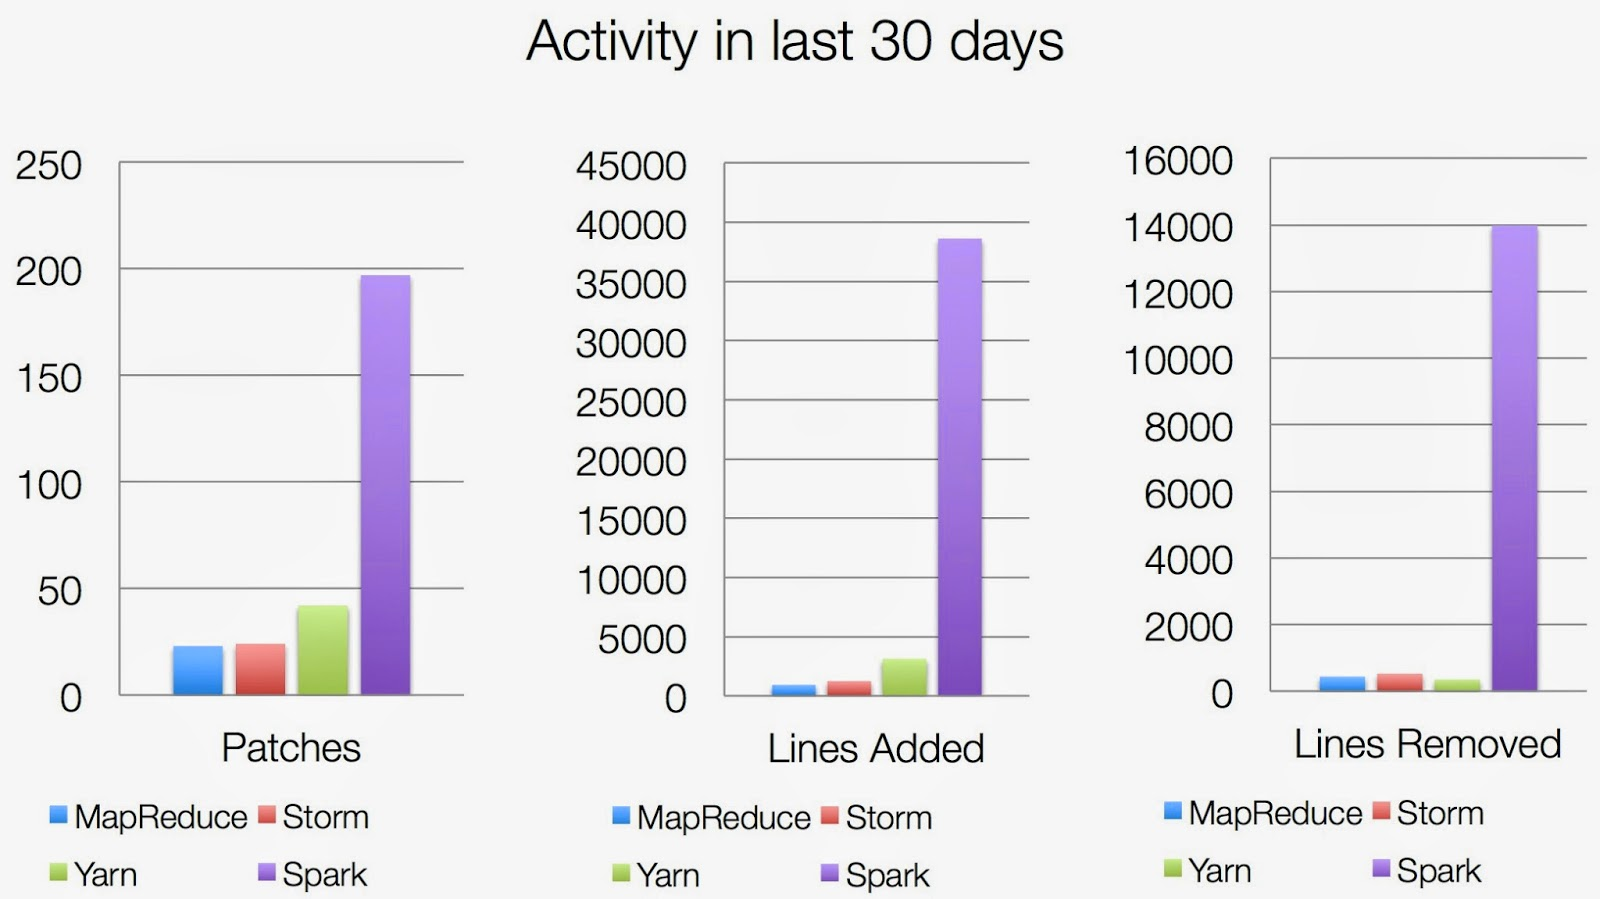 Apache Spark contributions